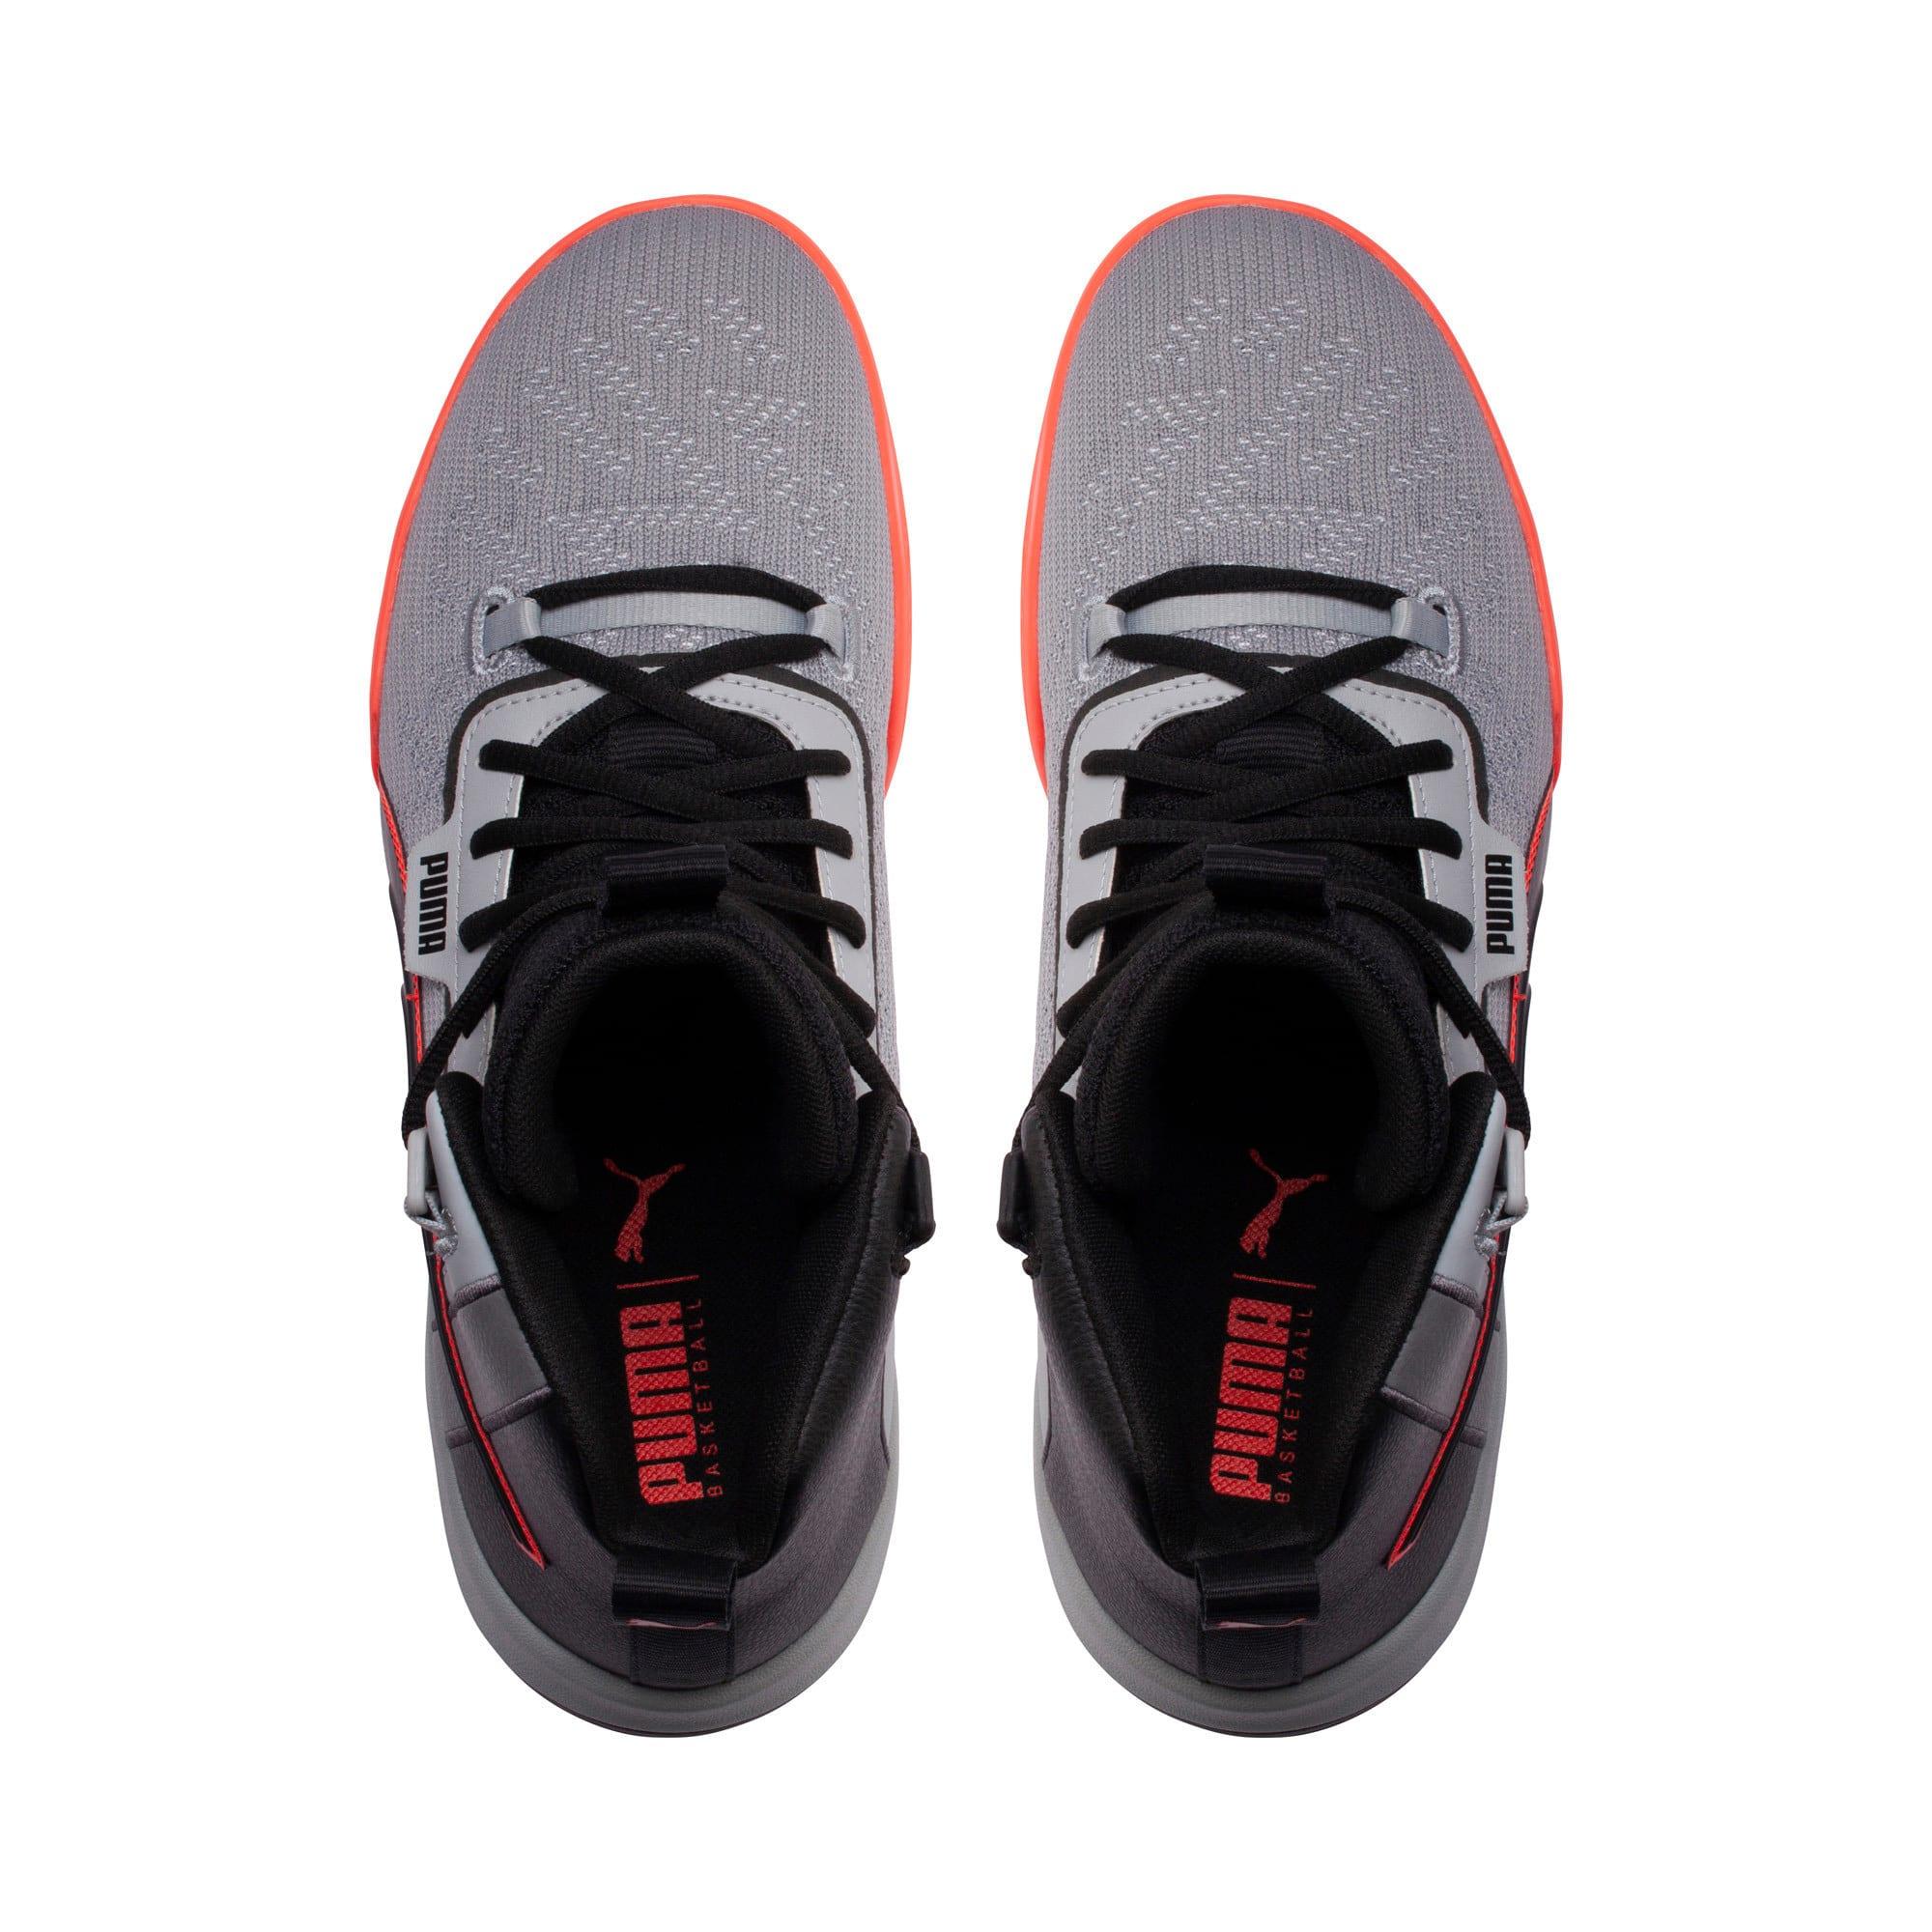 Thumbnail 6 of Legacy Disrupt Men's Basketball Shoes, Puma Black-Red Blast, medium